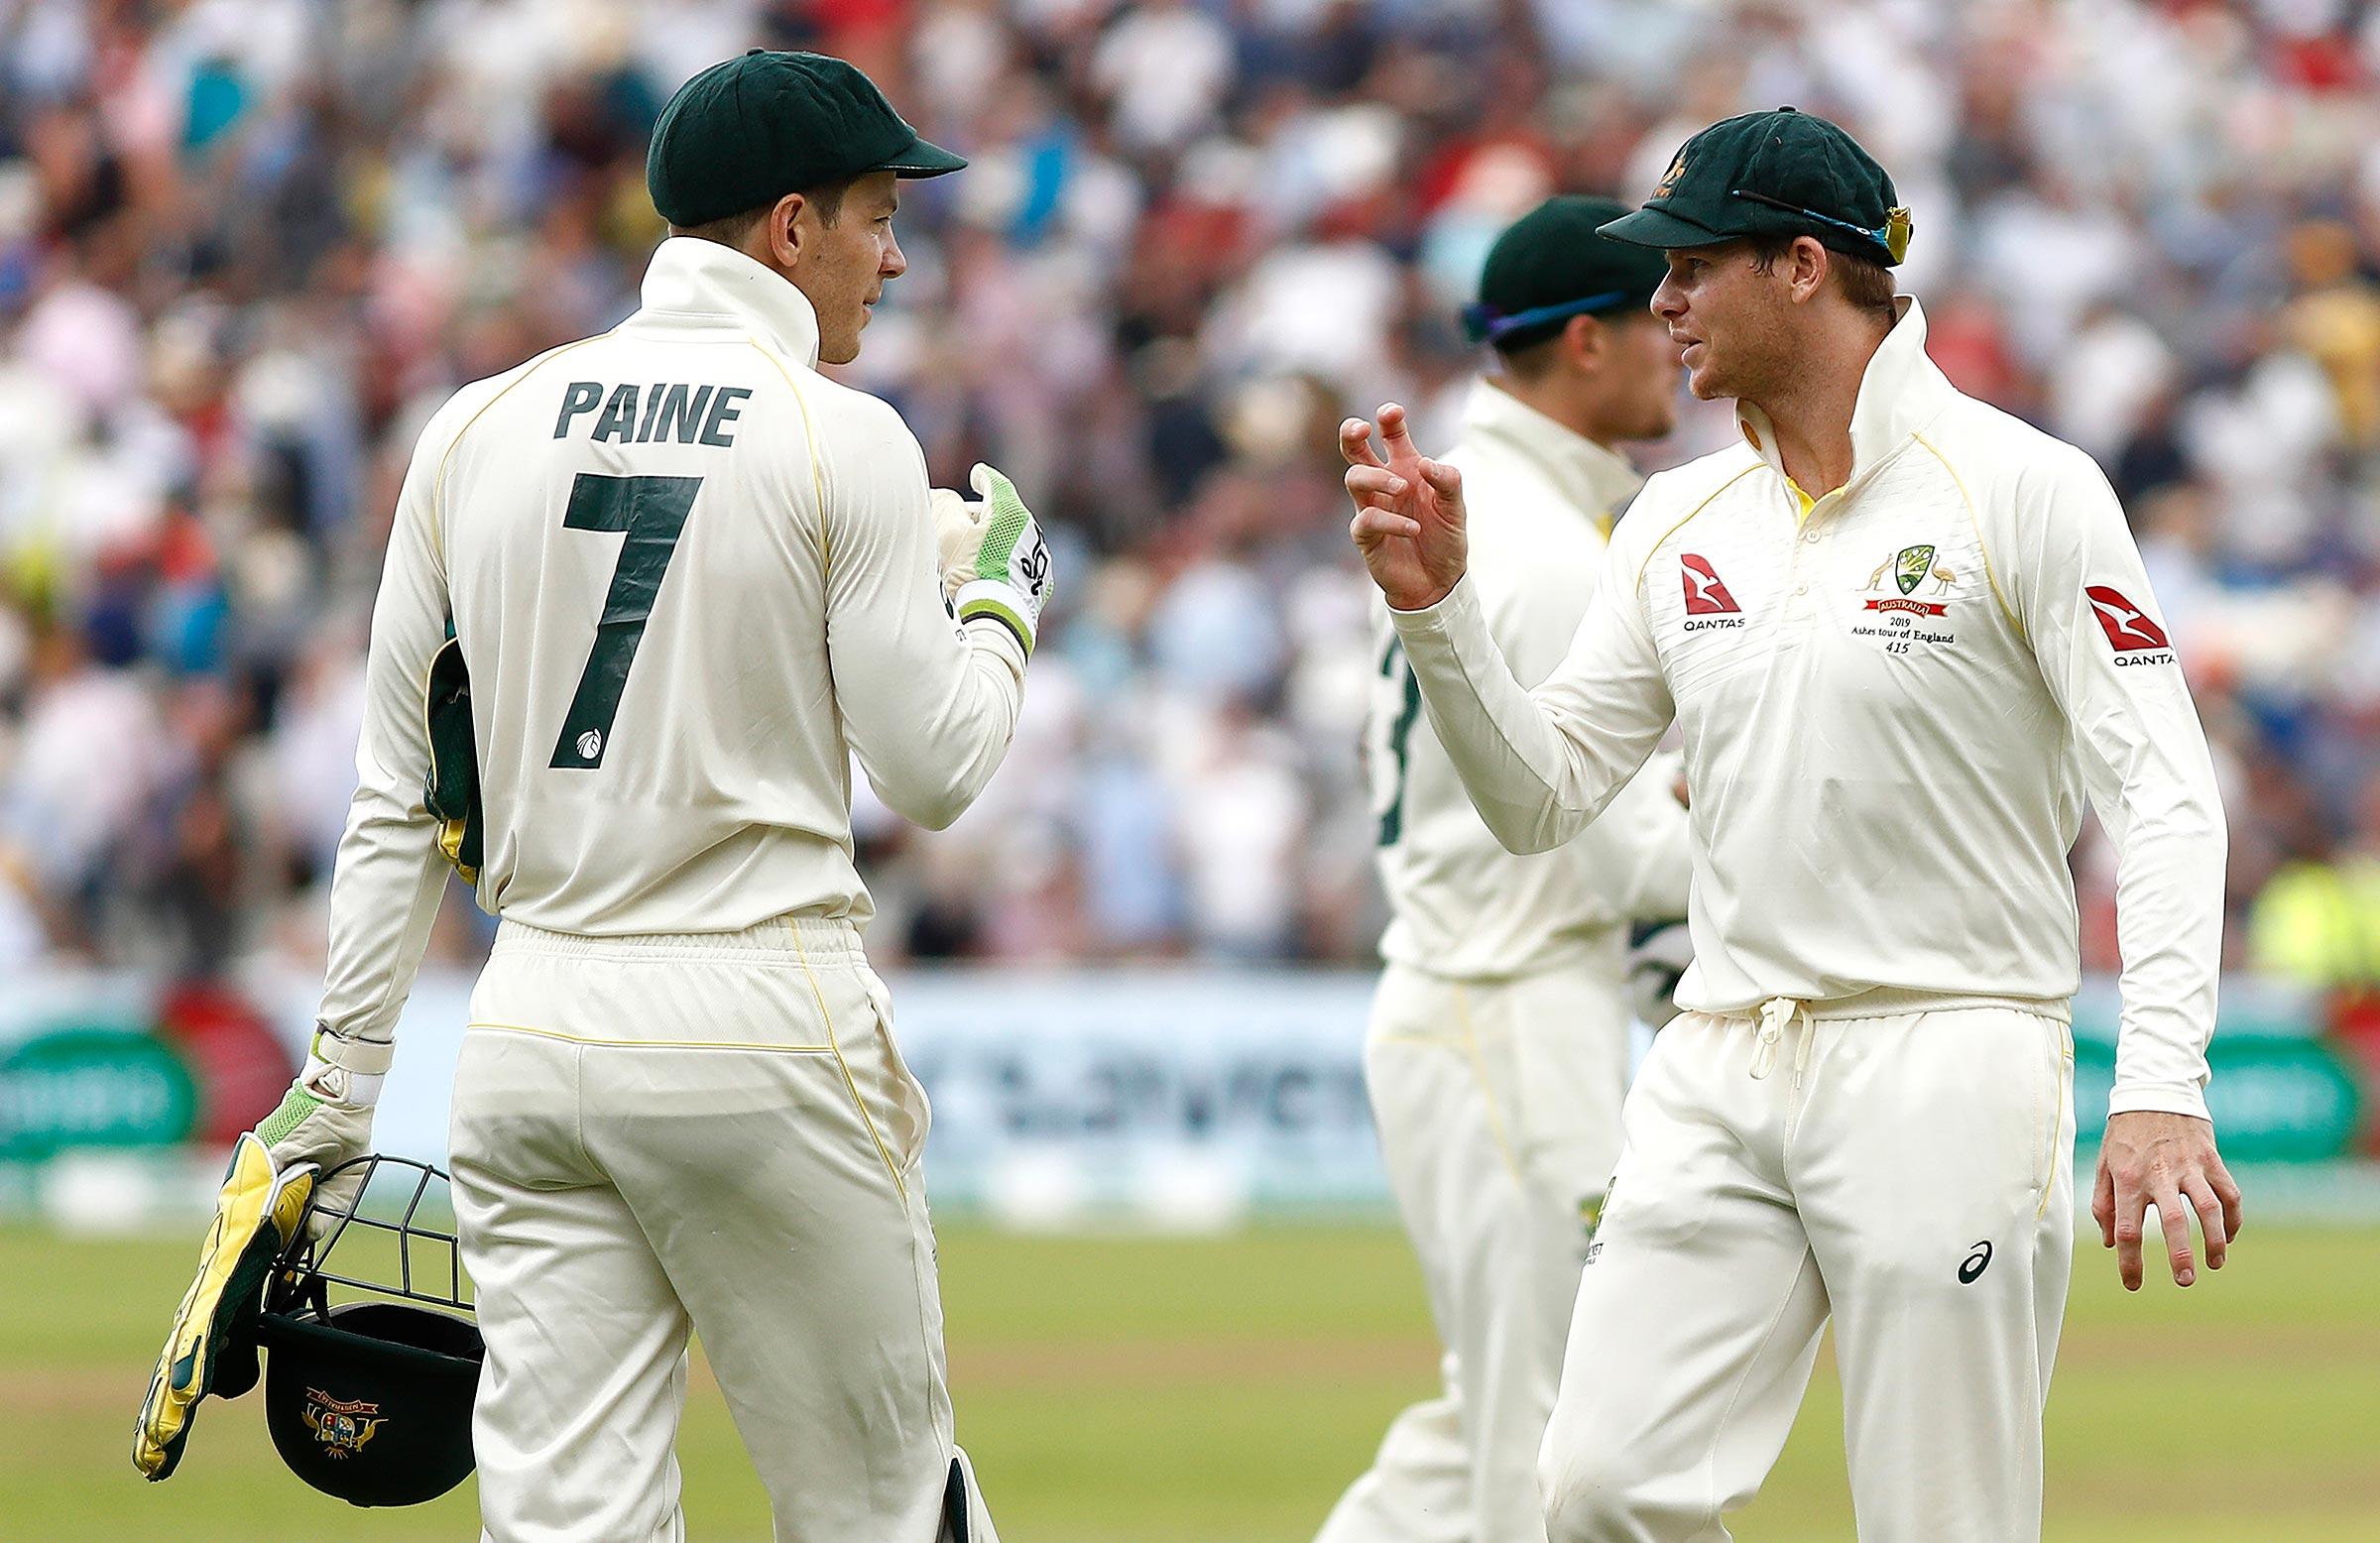 Paine and Smith talk tactics at Edgbaston // Getty